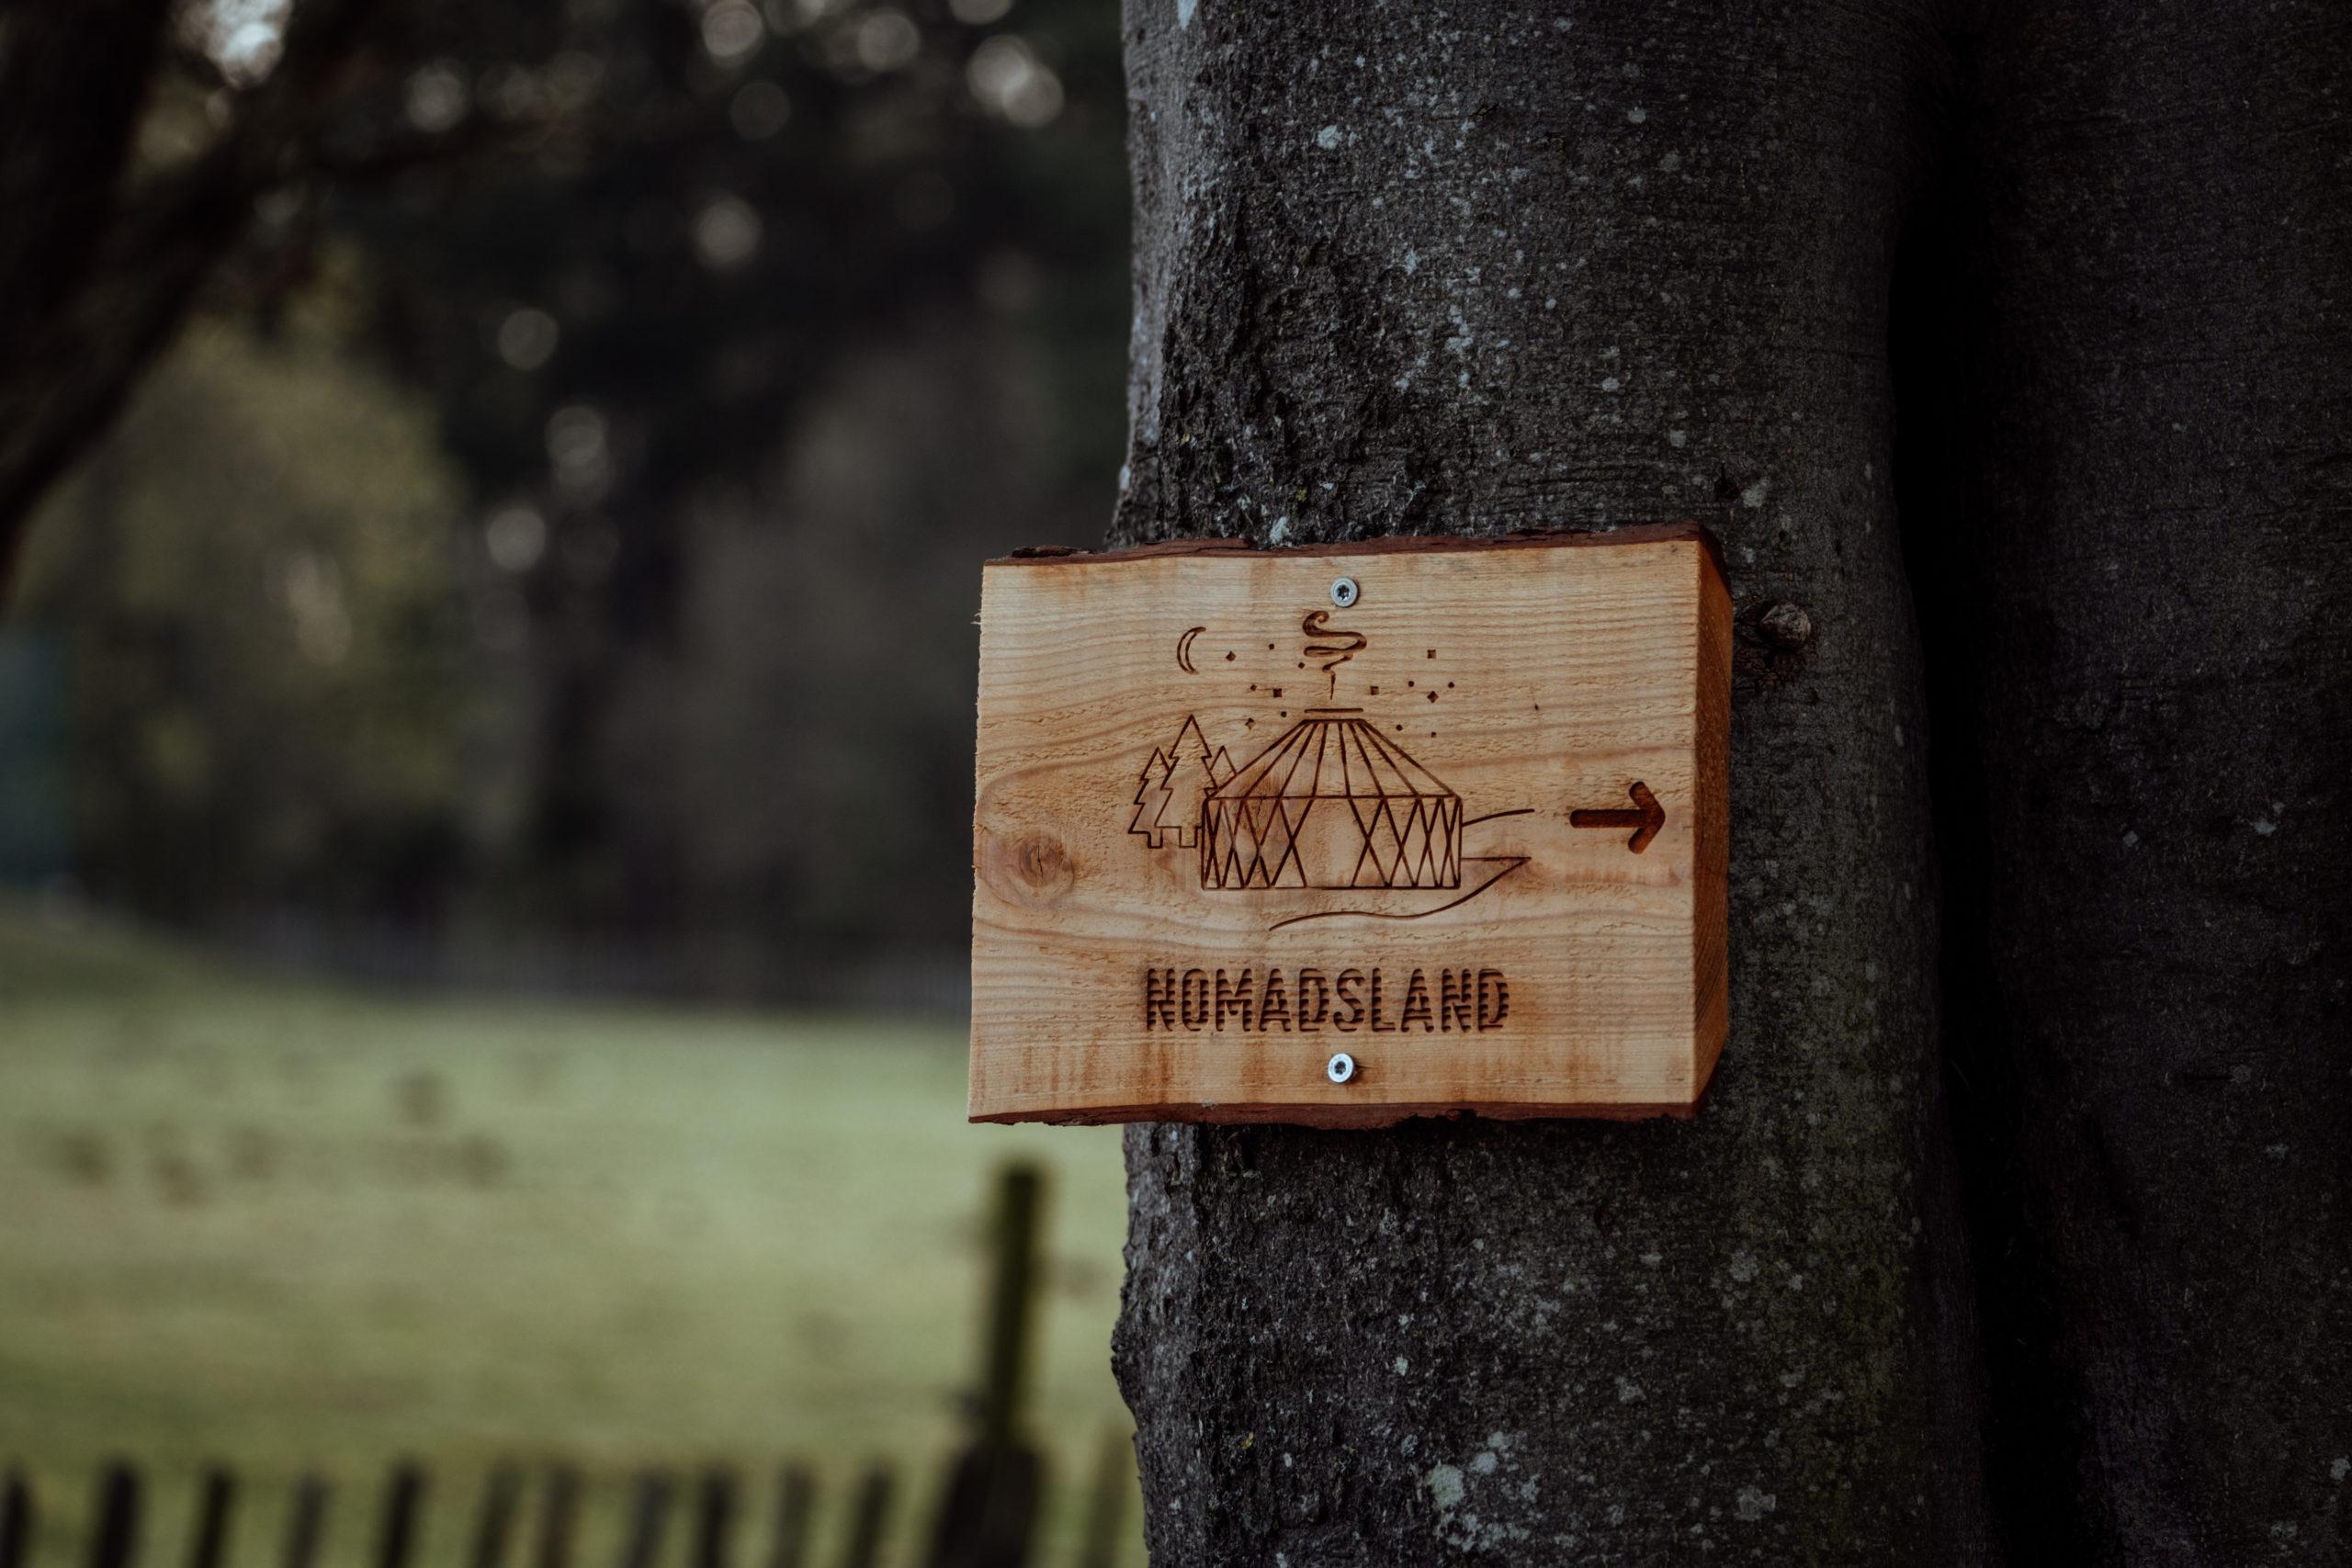 Nomadsland-7007 (1)